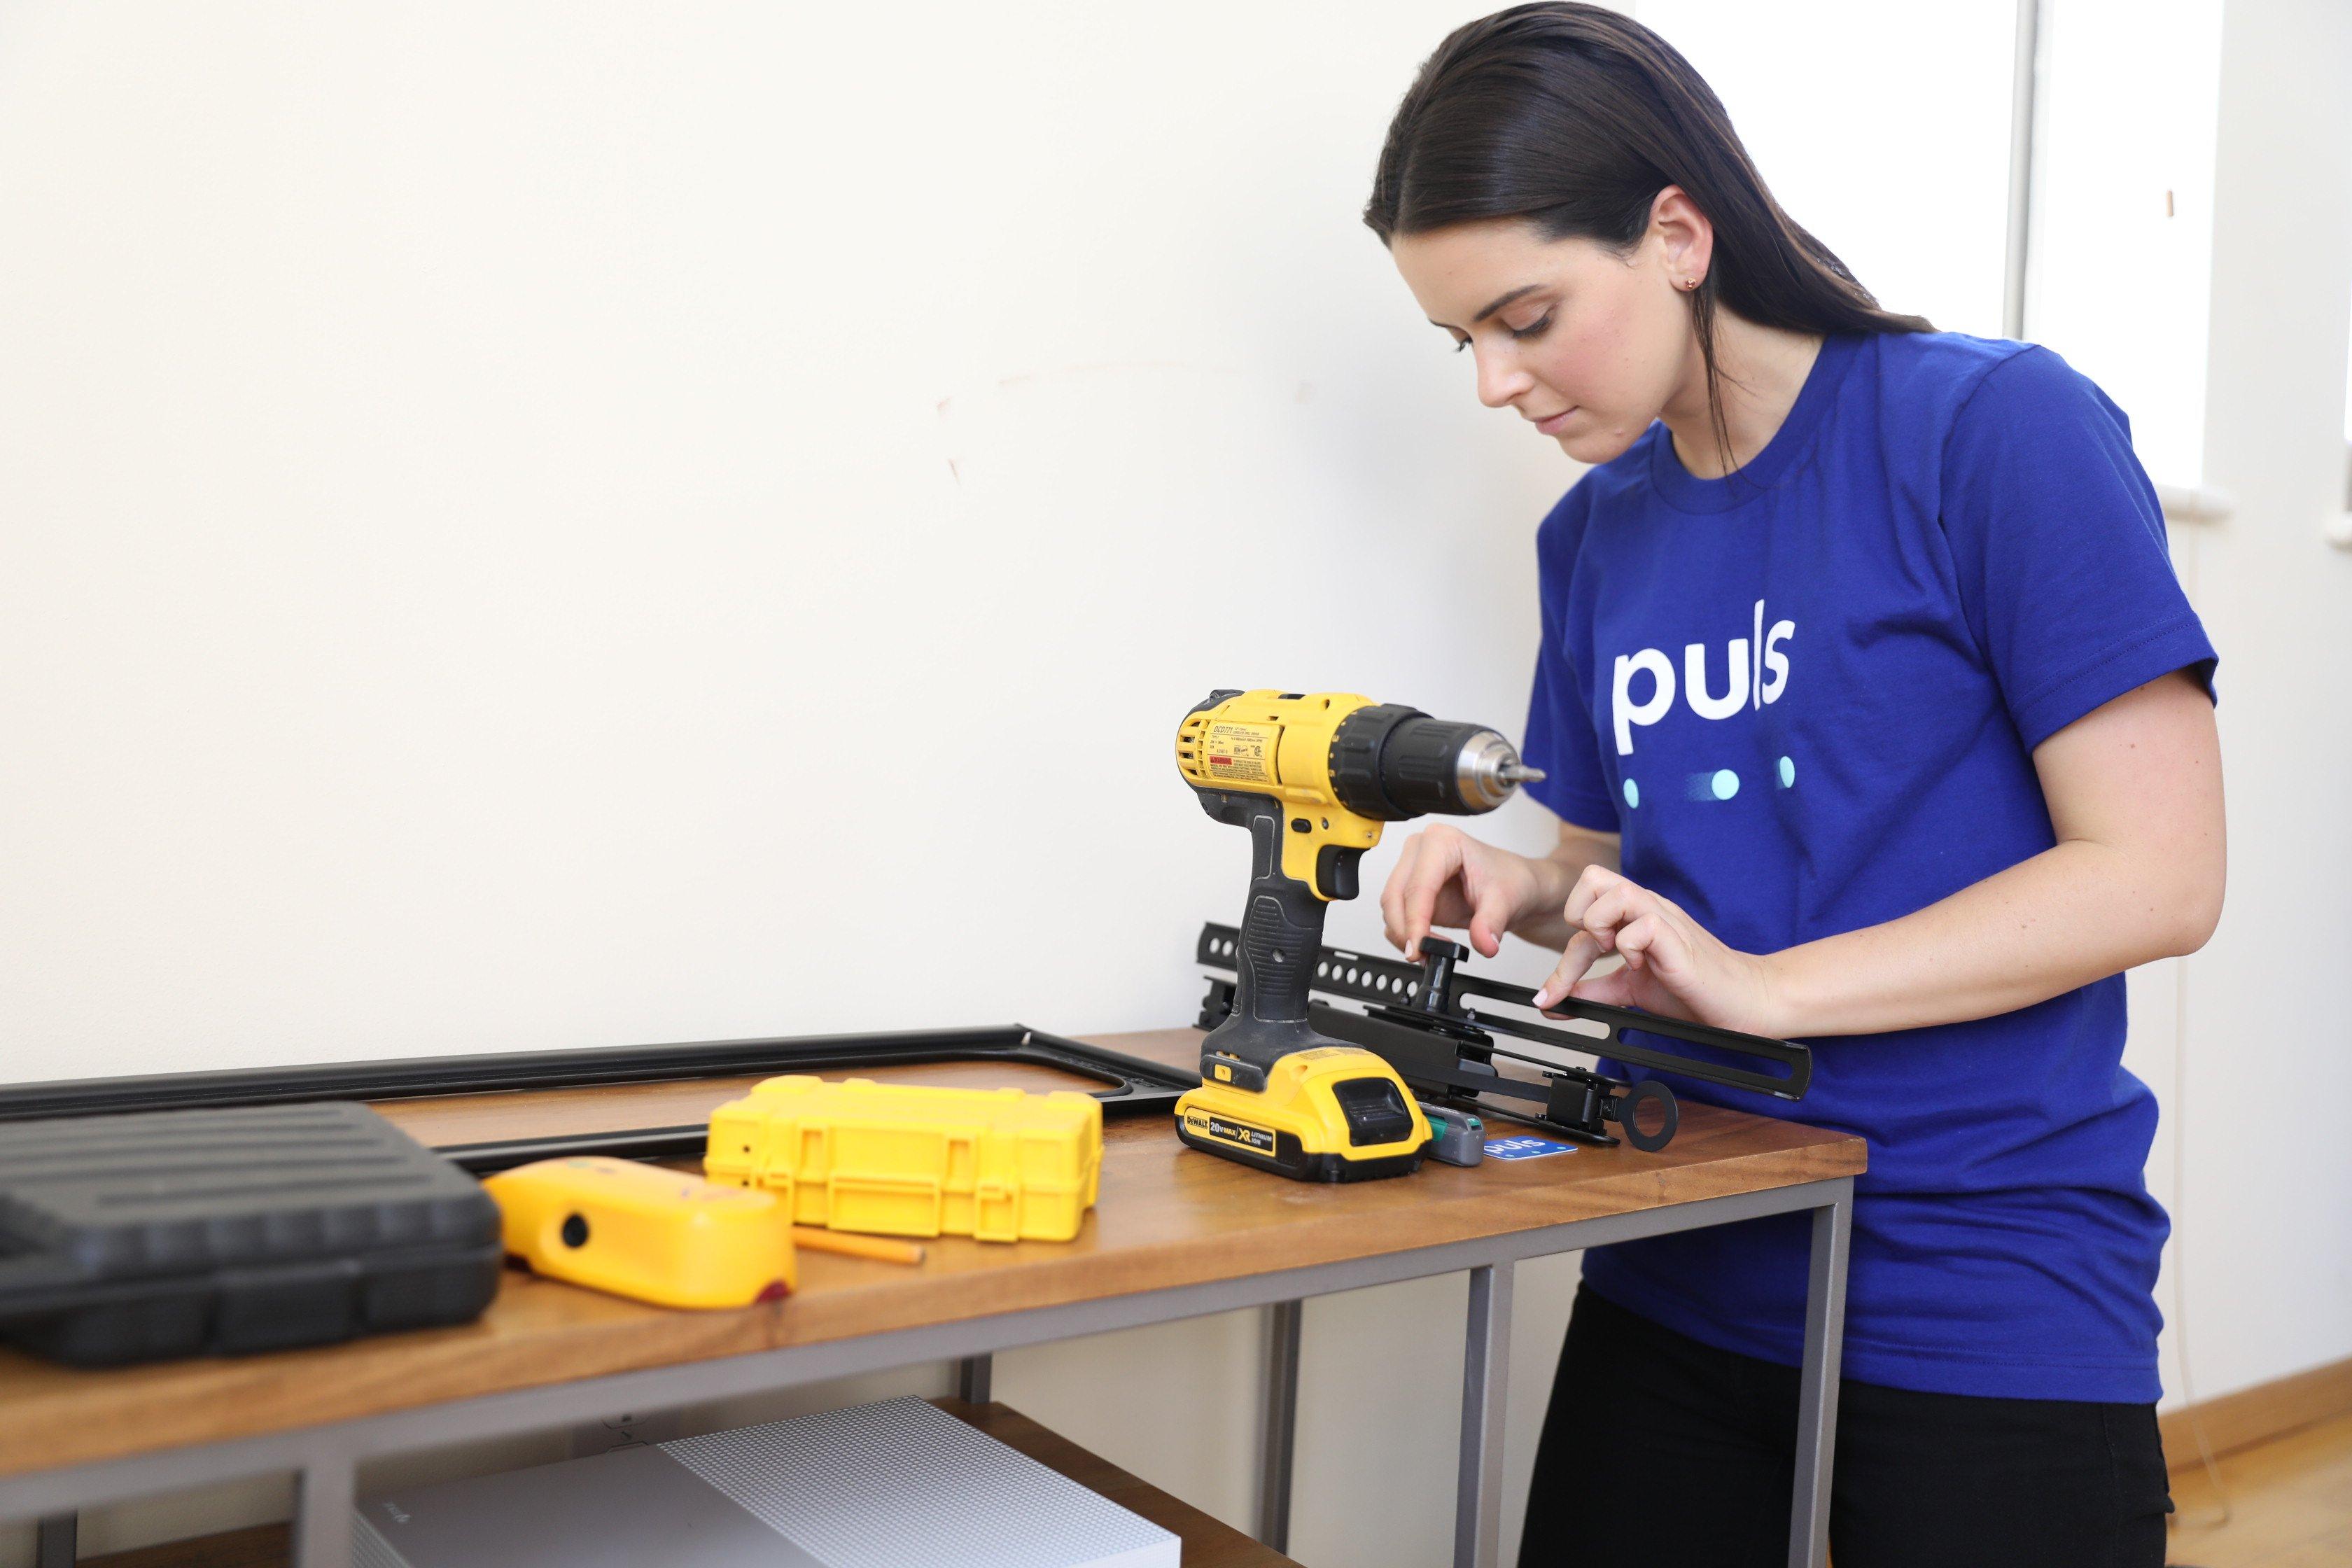 Puls TV mounting technician